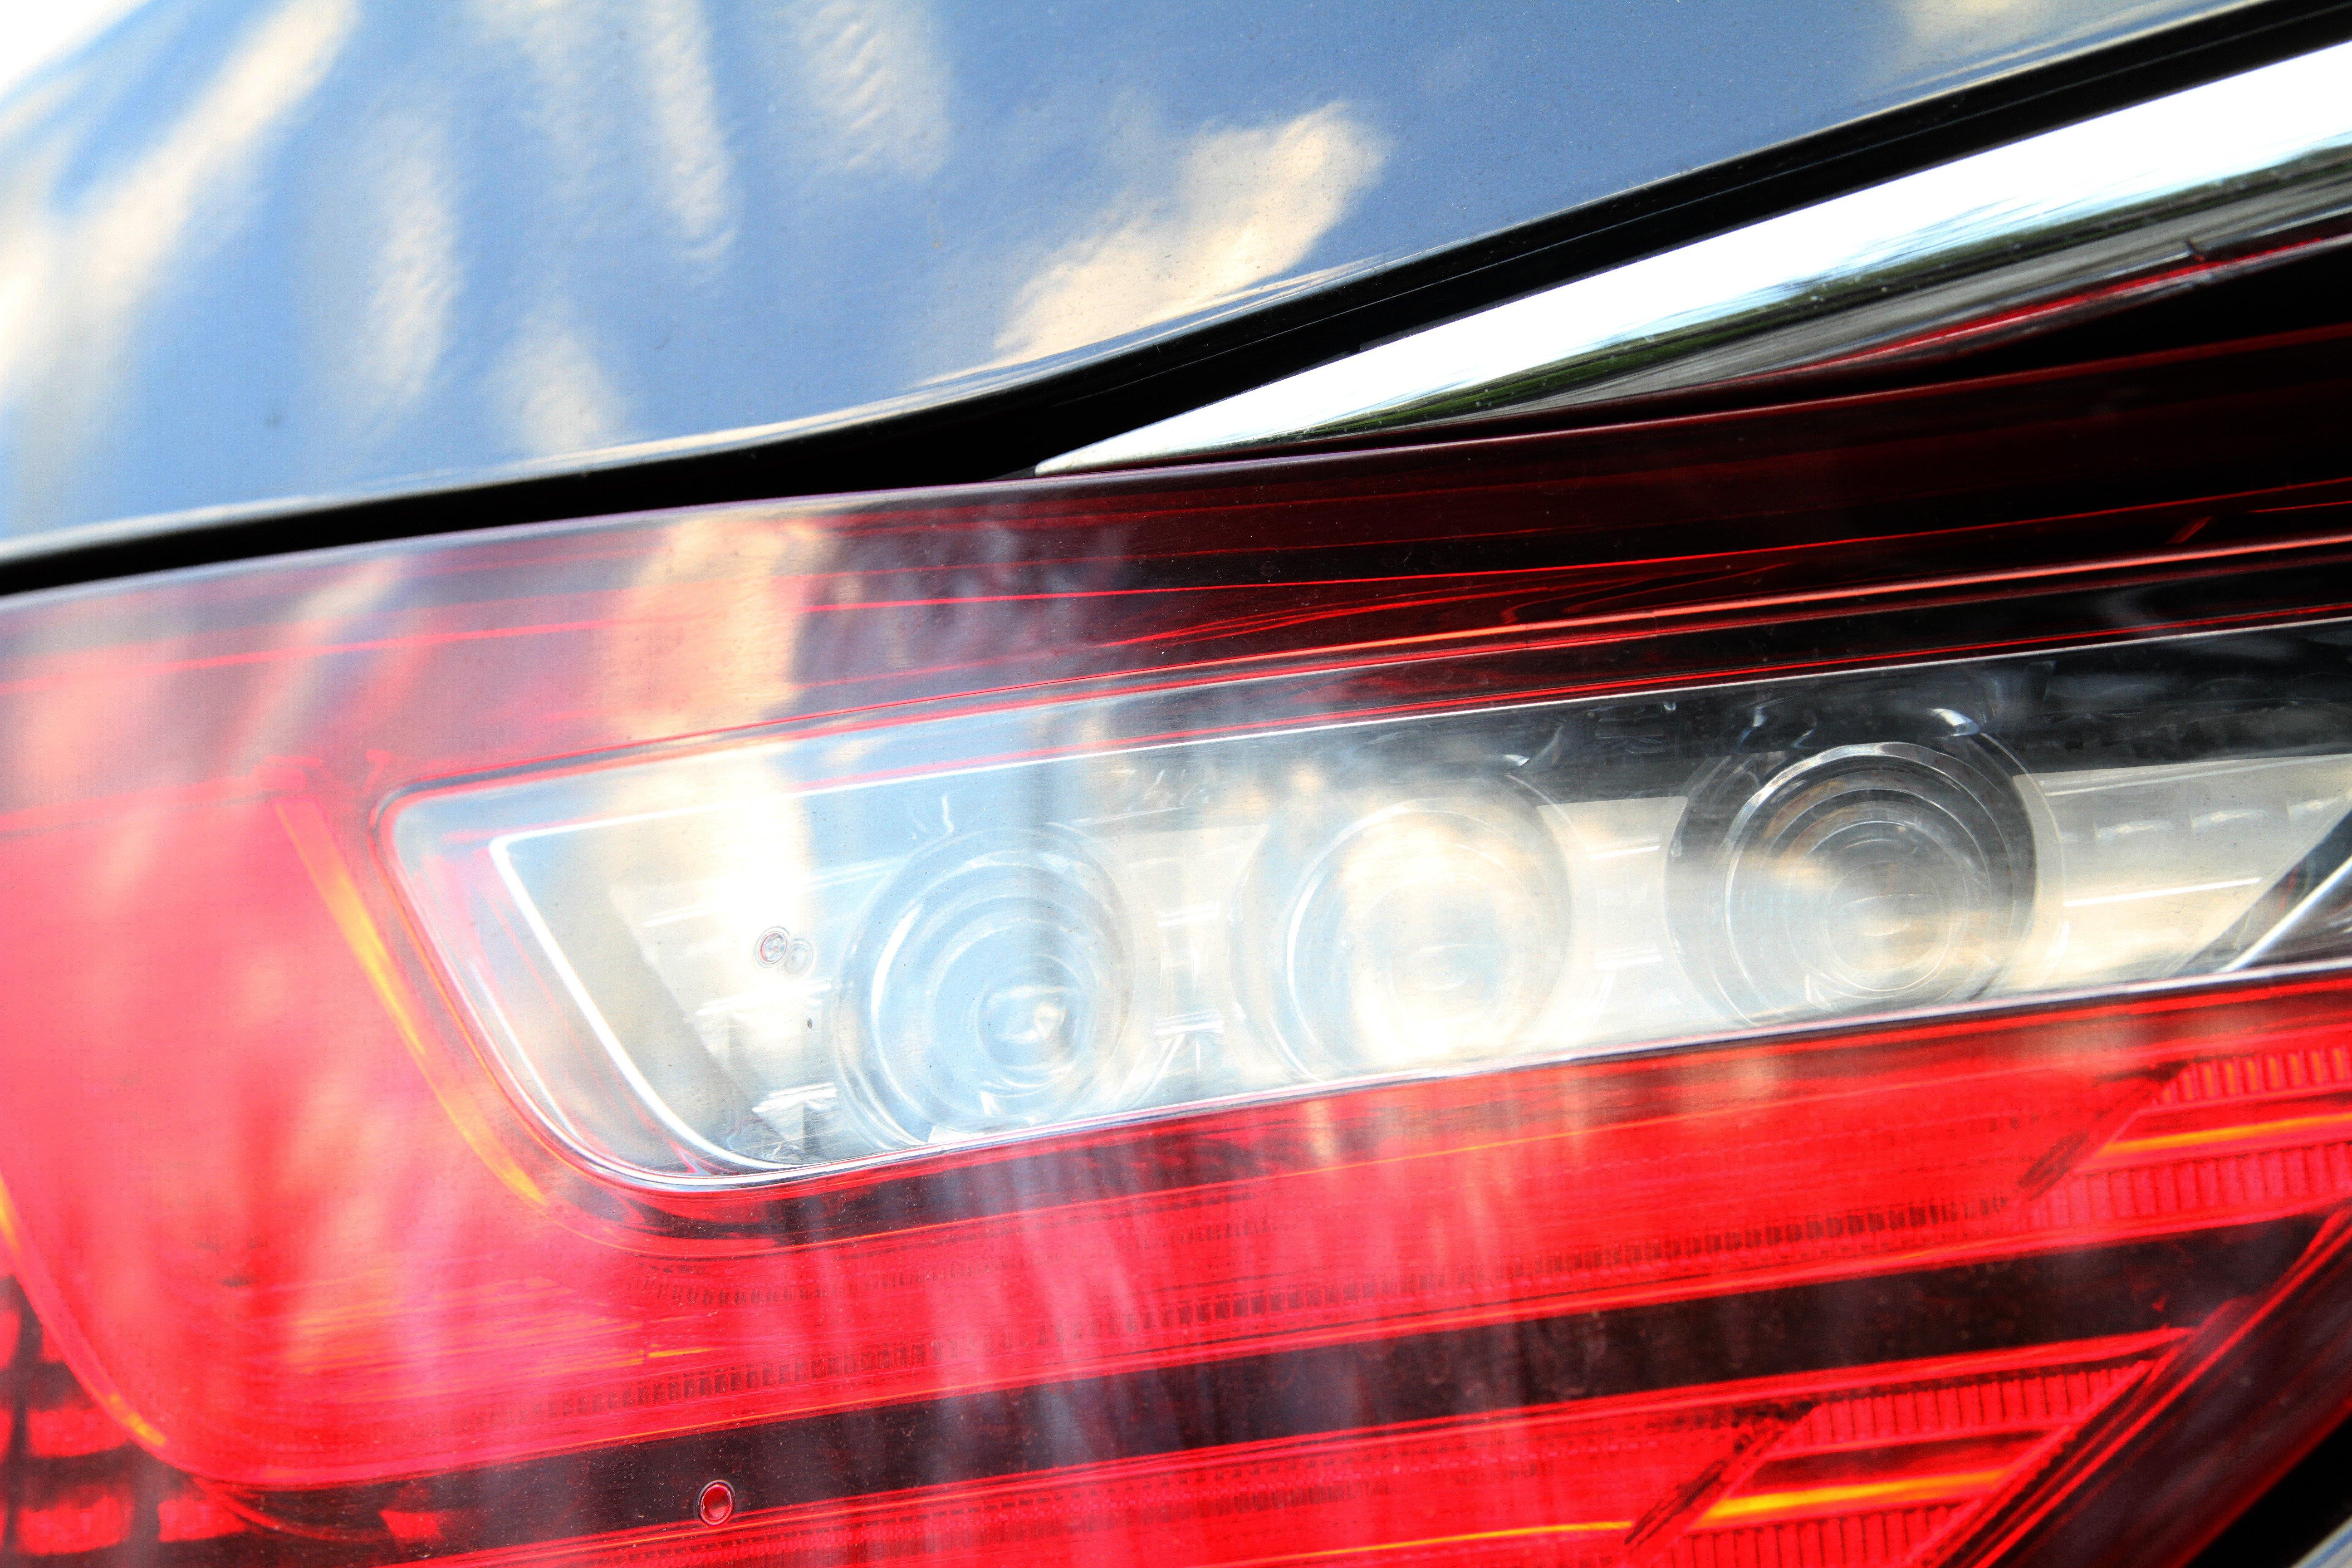 Lexus GS 450h rear lamps, Automobiles, Back, Bulbs, Cars, HQ Photo